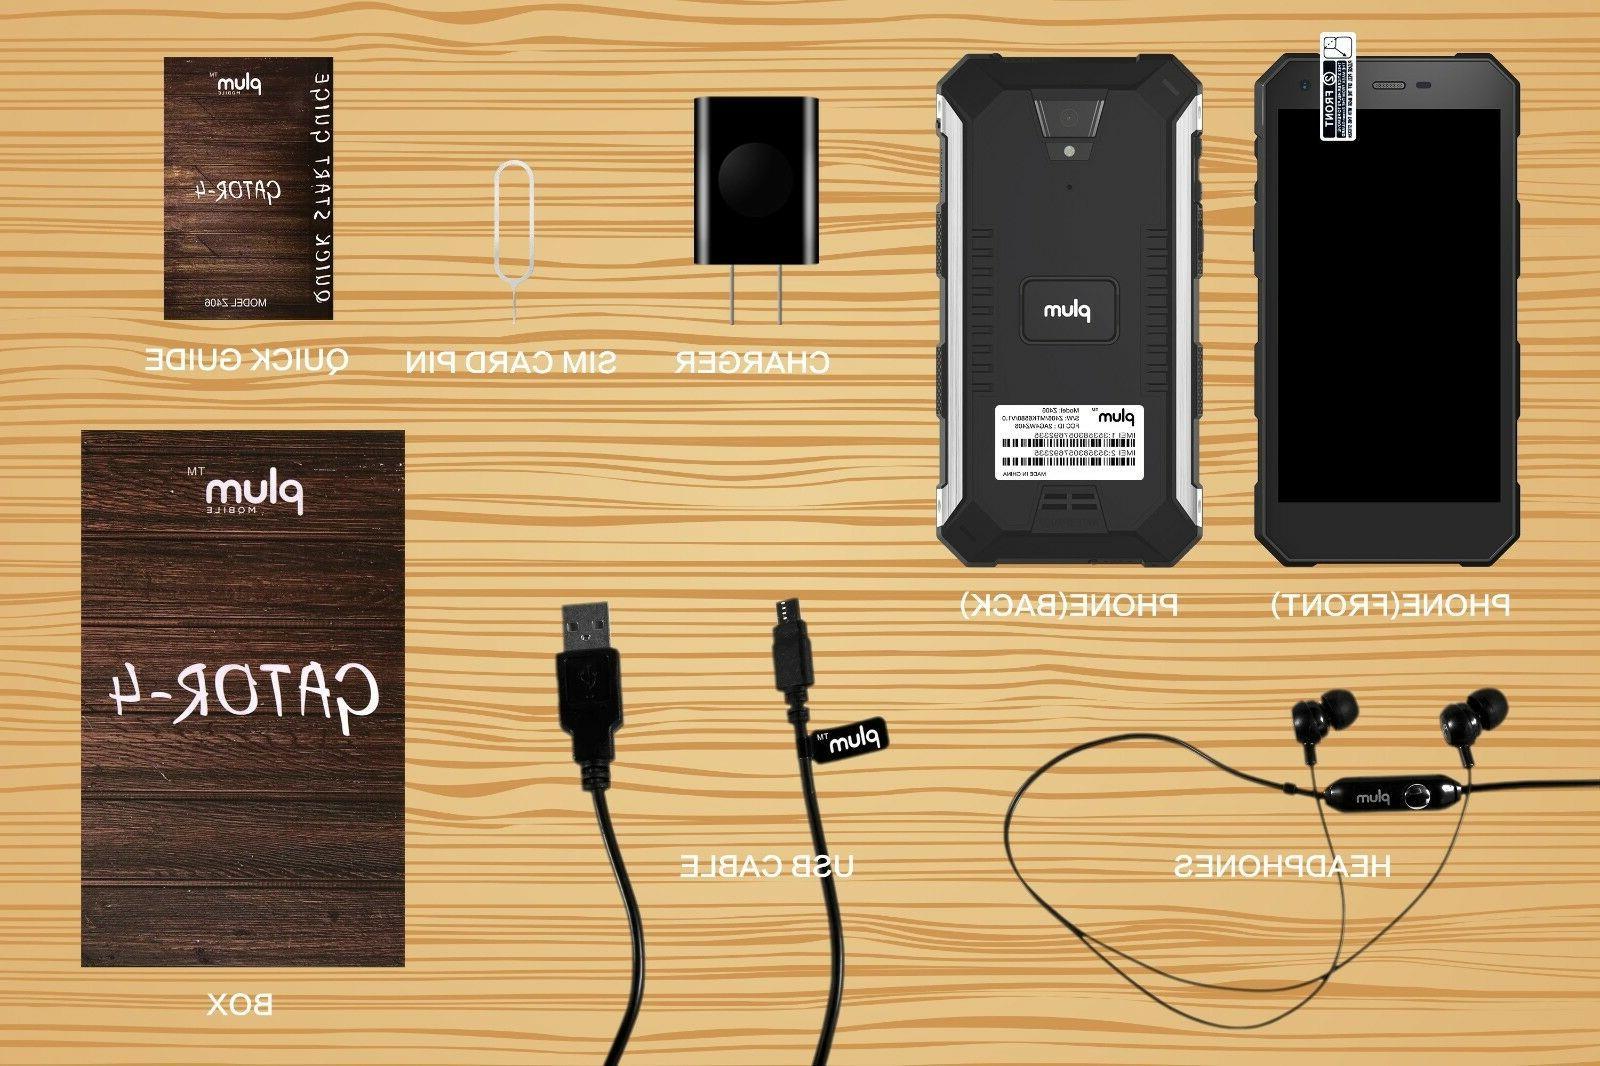 Plum 4 Rugged 4G Unlocked Smart Phone 5000 mAh IP68 Gra